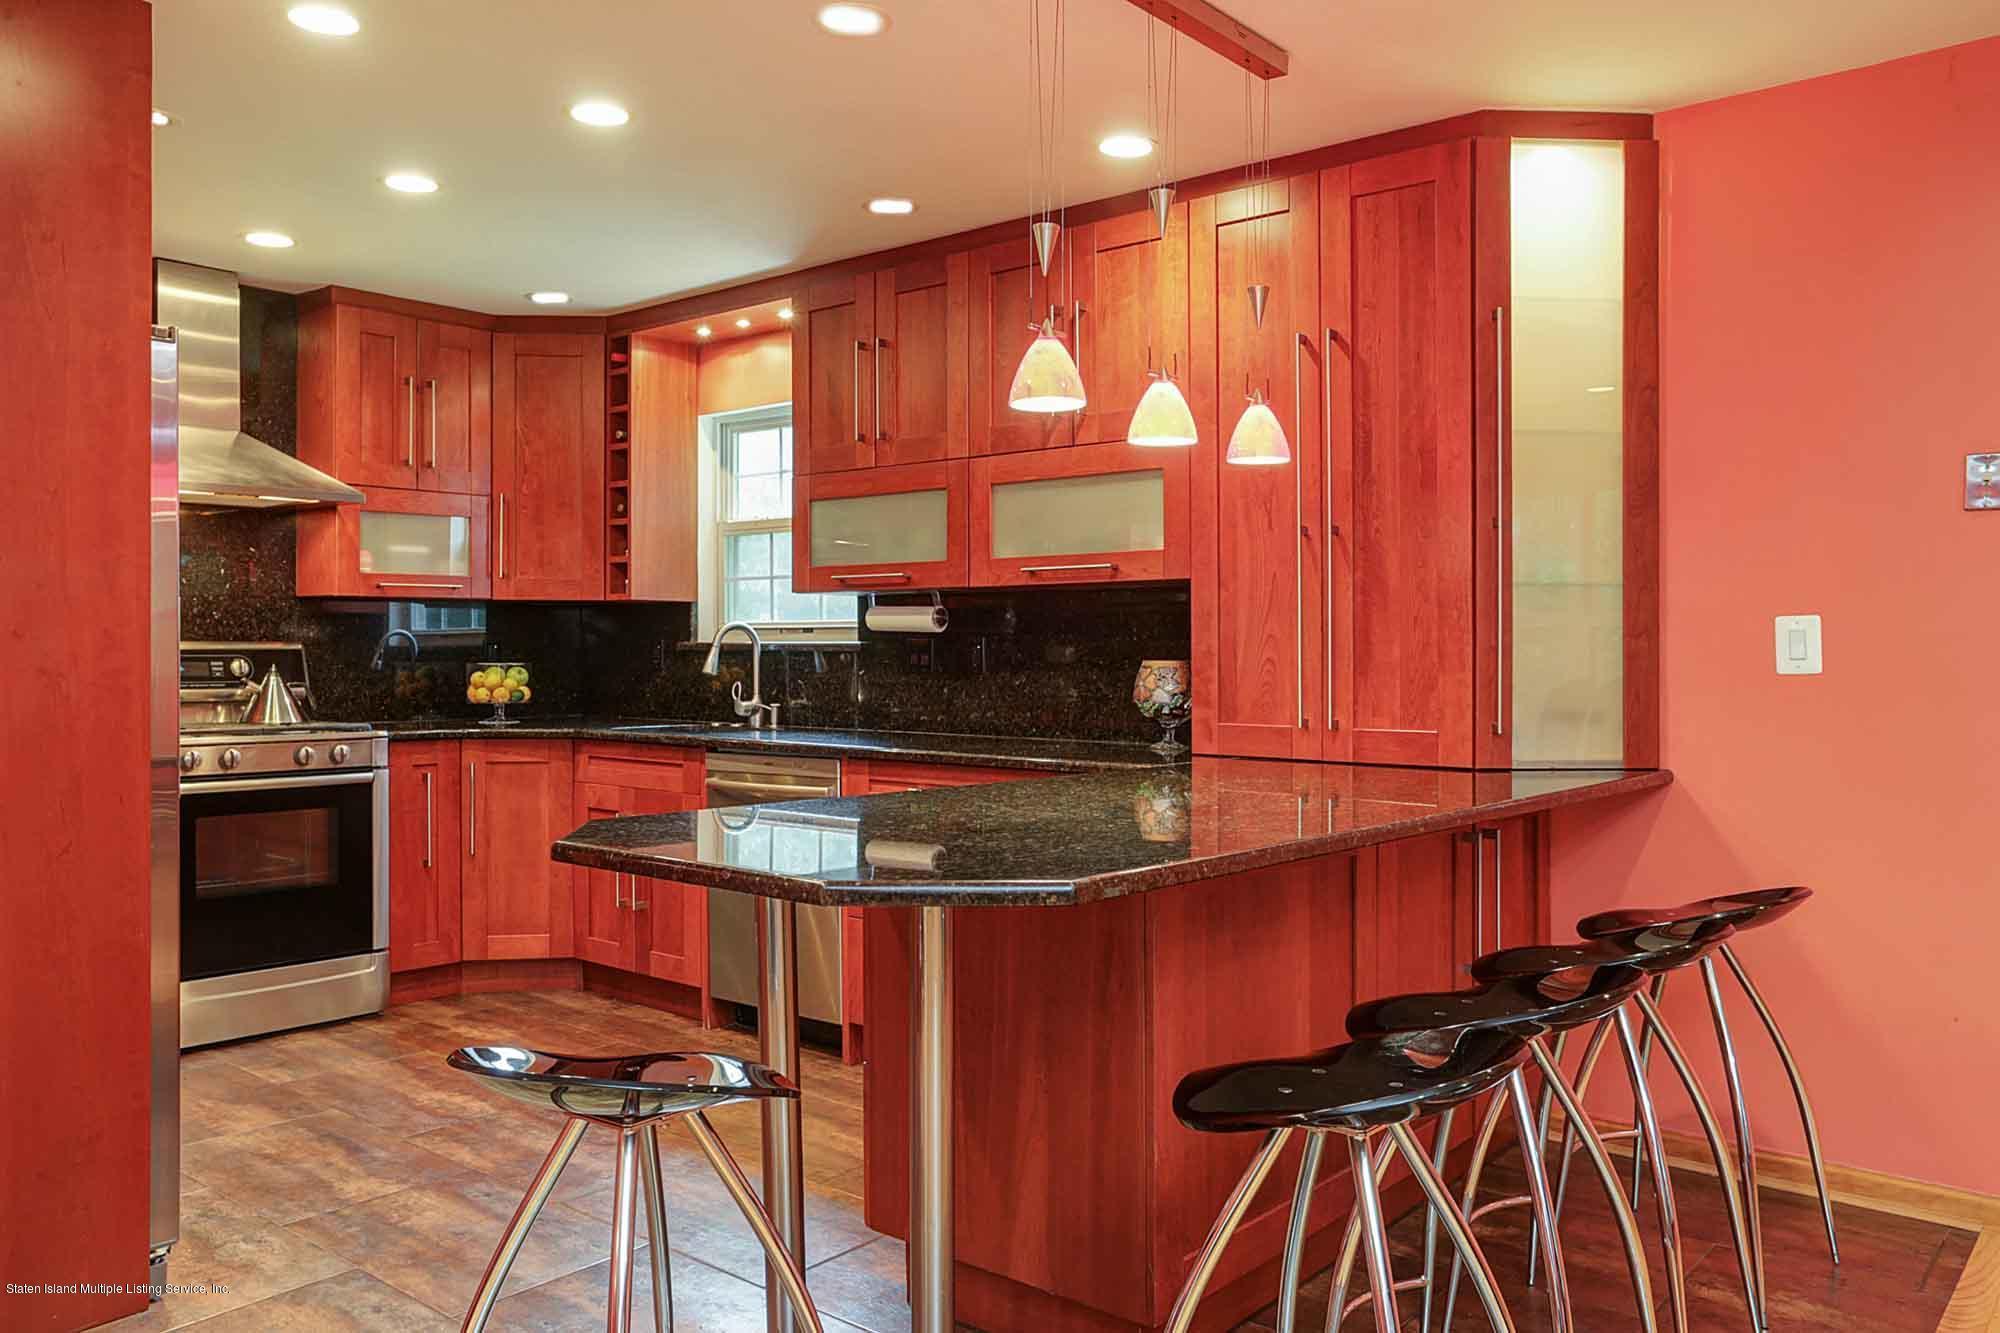 Single Family - Detached 7 Crestwood Road  Matawan, NY 07747, MLS-1126949-37